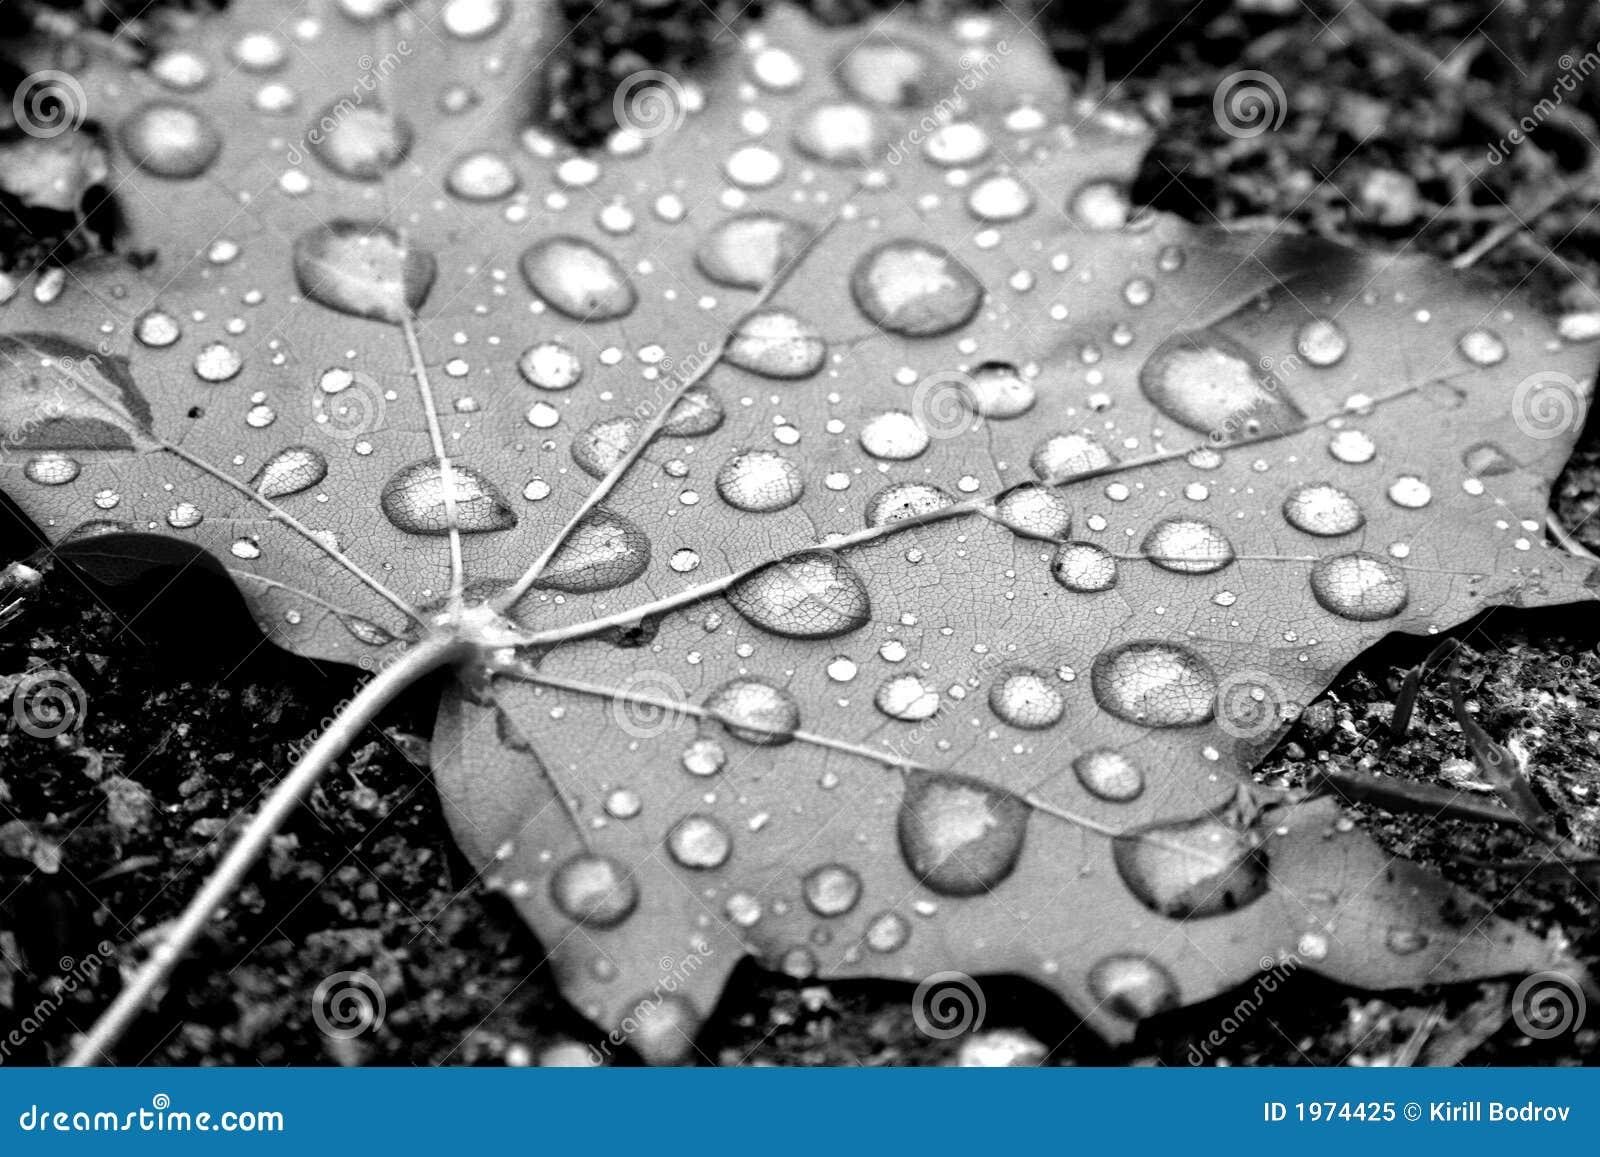 Dew On Maple Leaf Royalty Free Stock Photo - Image: 1974425